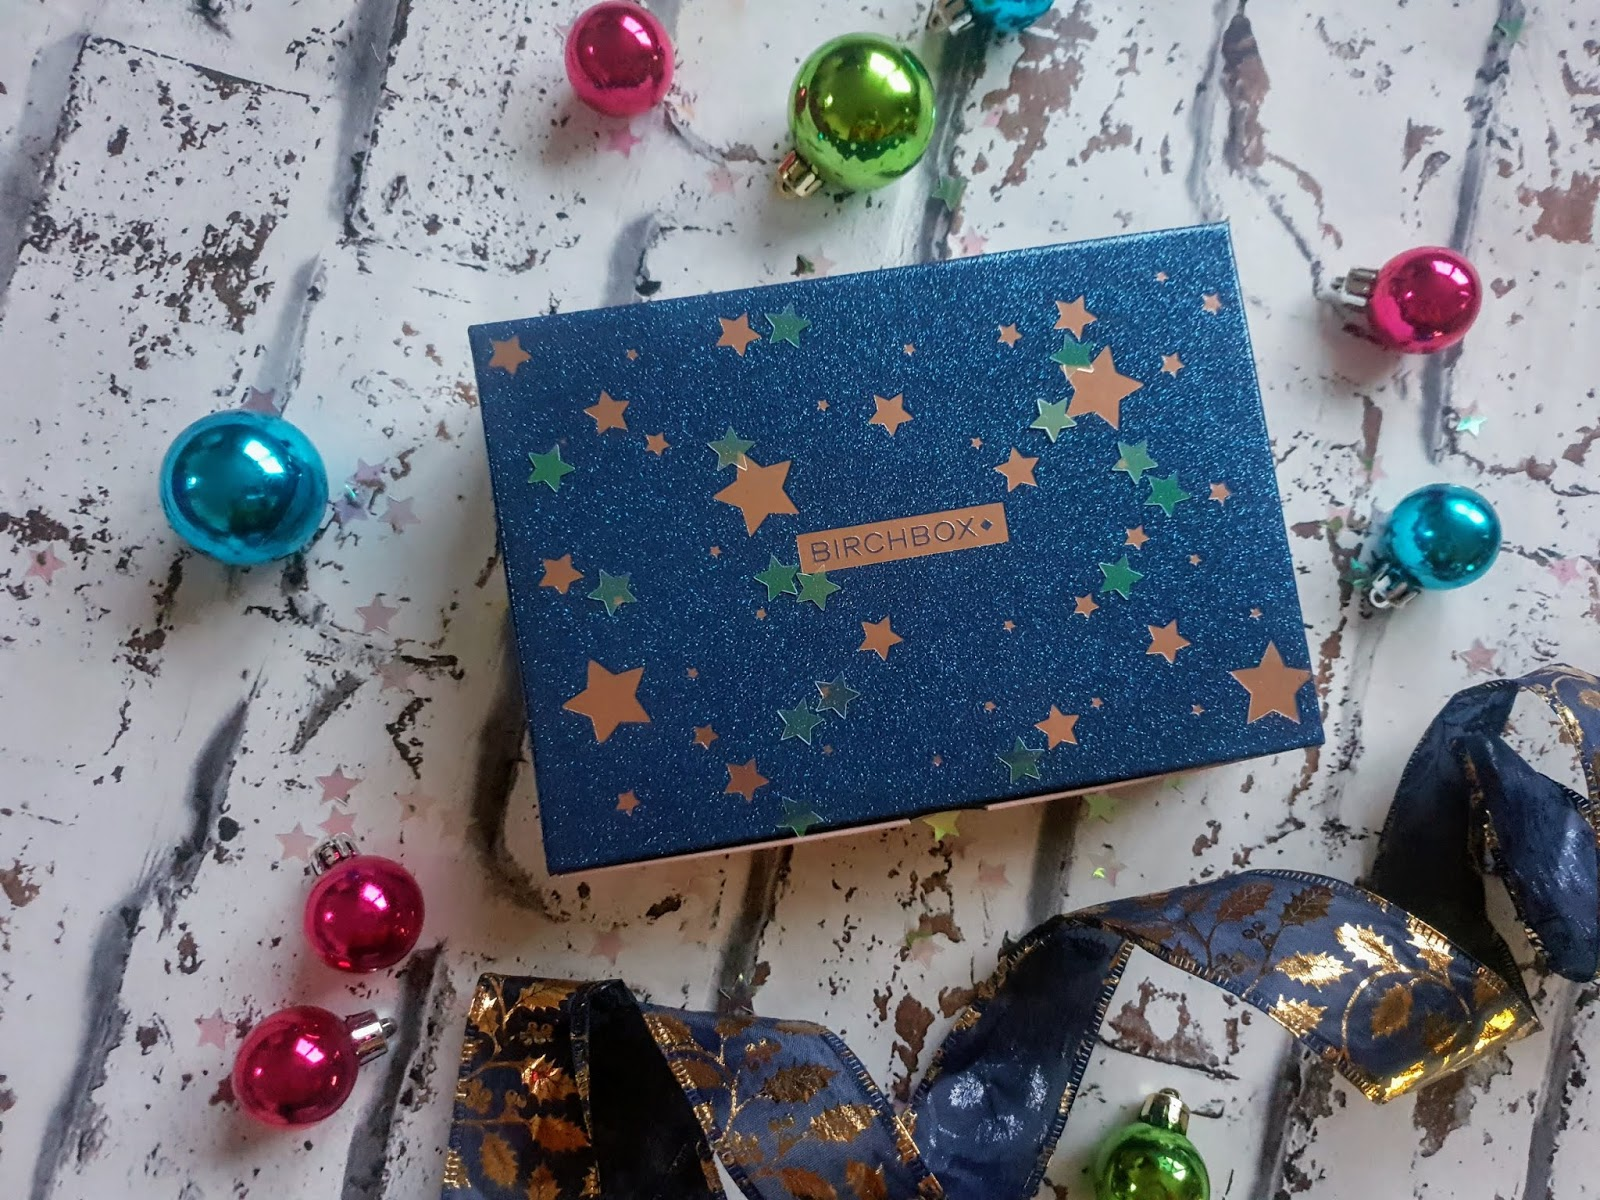 Birchbox december 2018